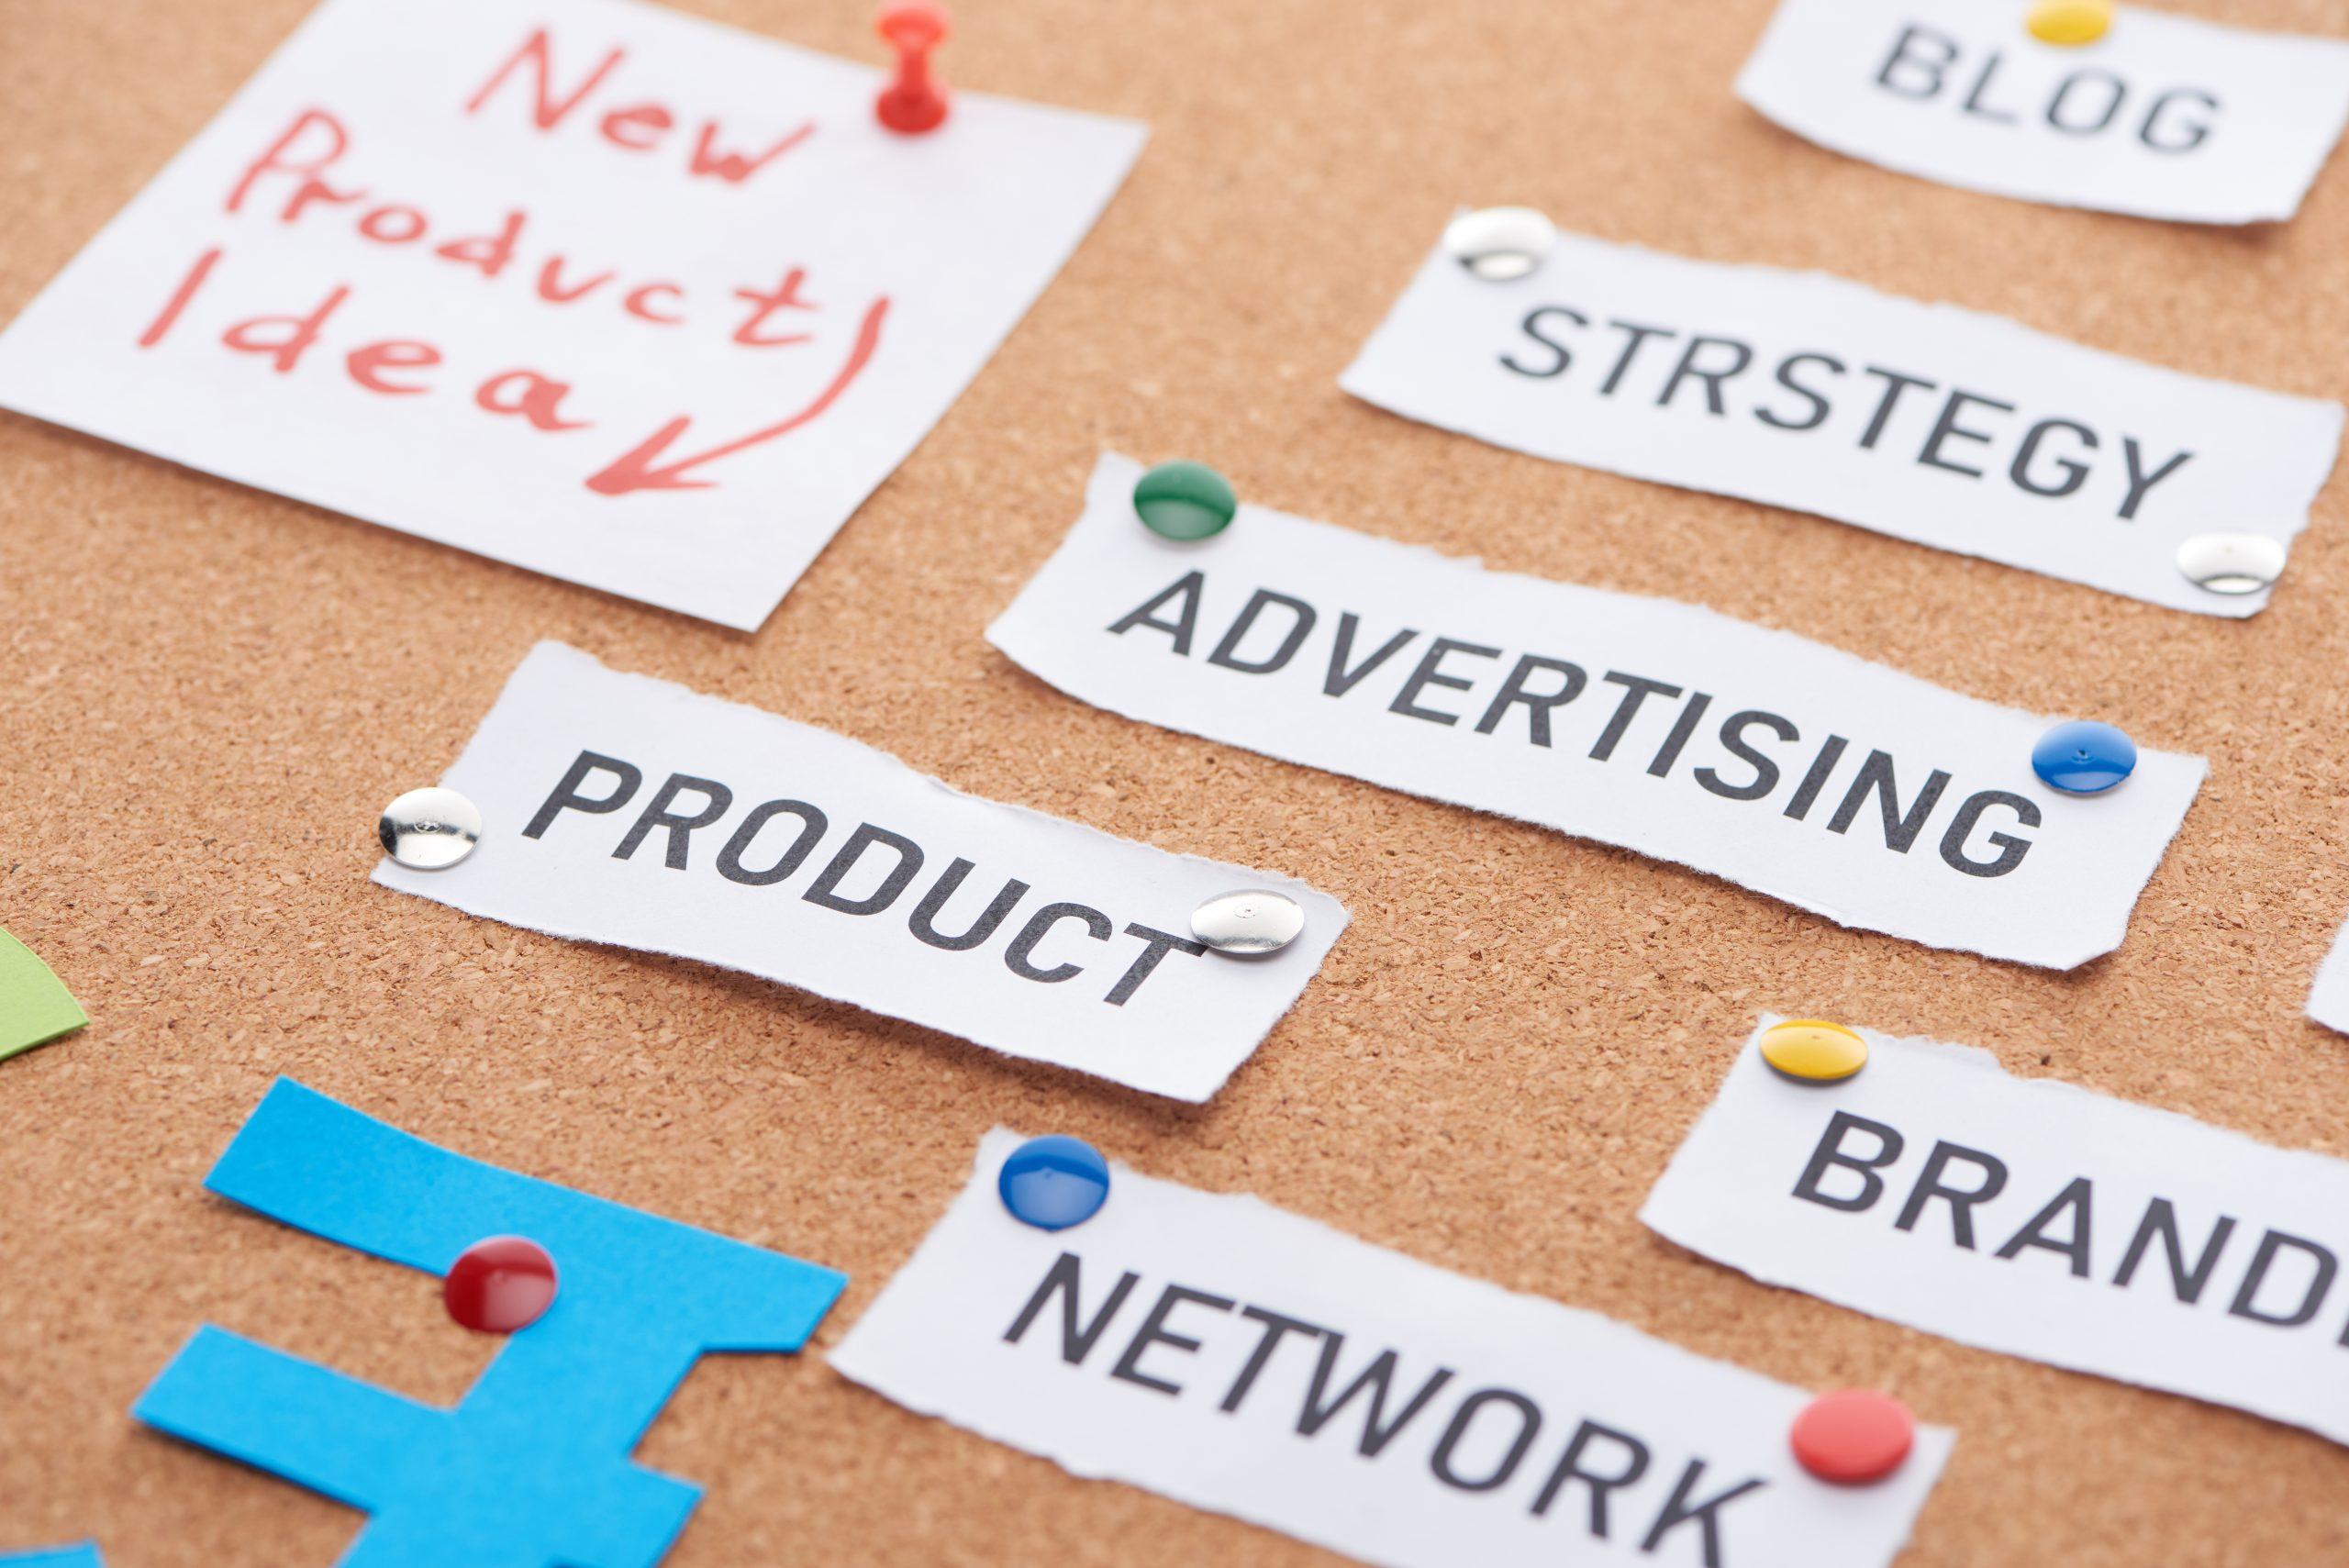 PPC advertising for B2B